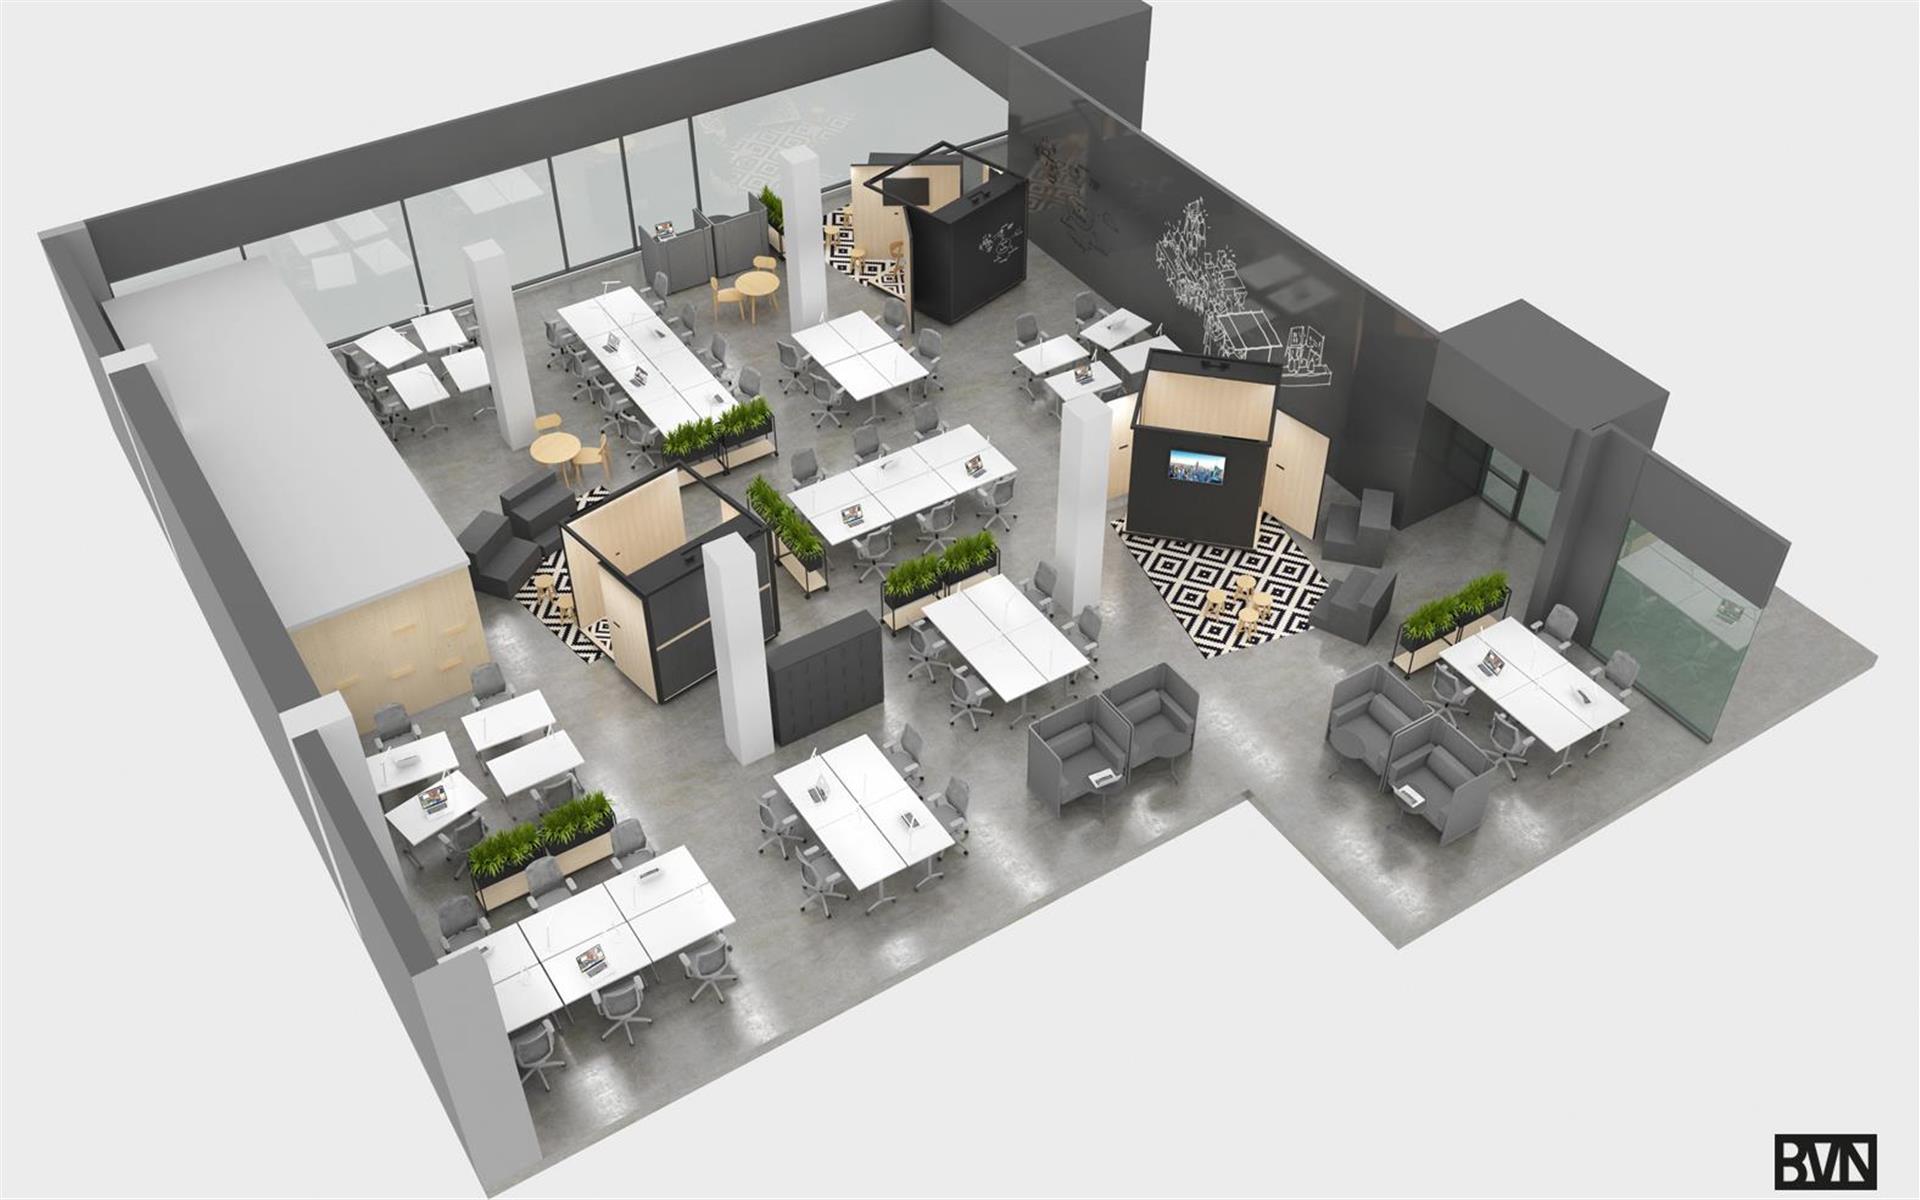 Swig Co   501 Second Street - altSpace Team Office - Suite 211